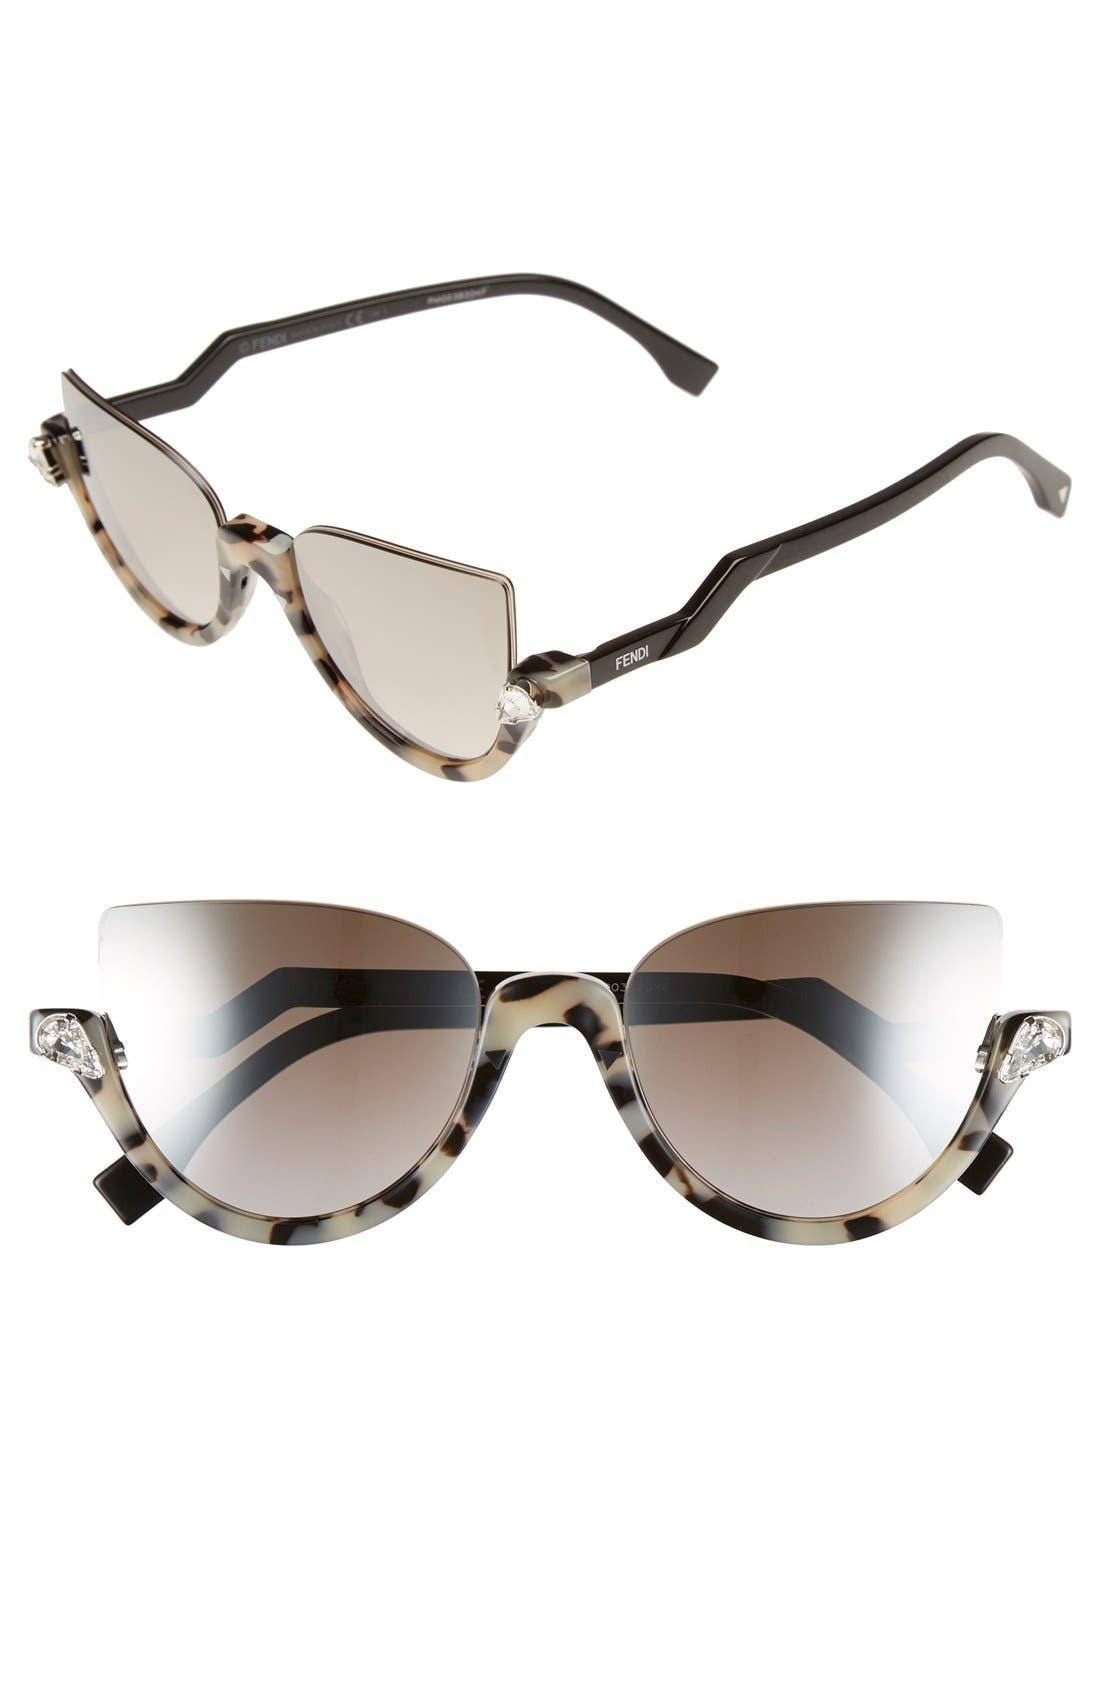 52mm Sunglasses,                             Main thumbnail 1, color,                             Havana/ Shiny Black